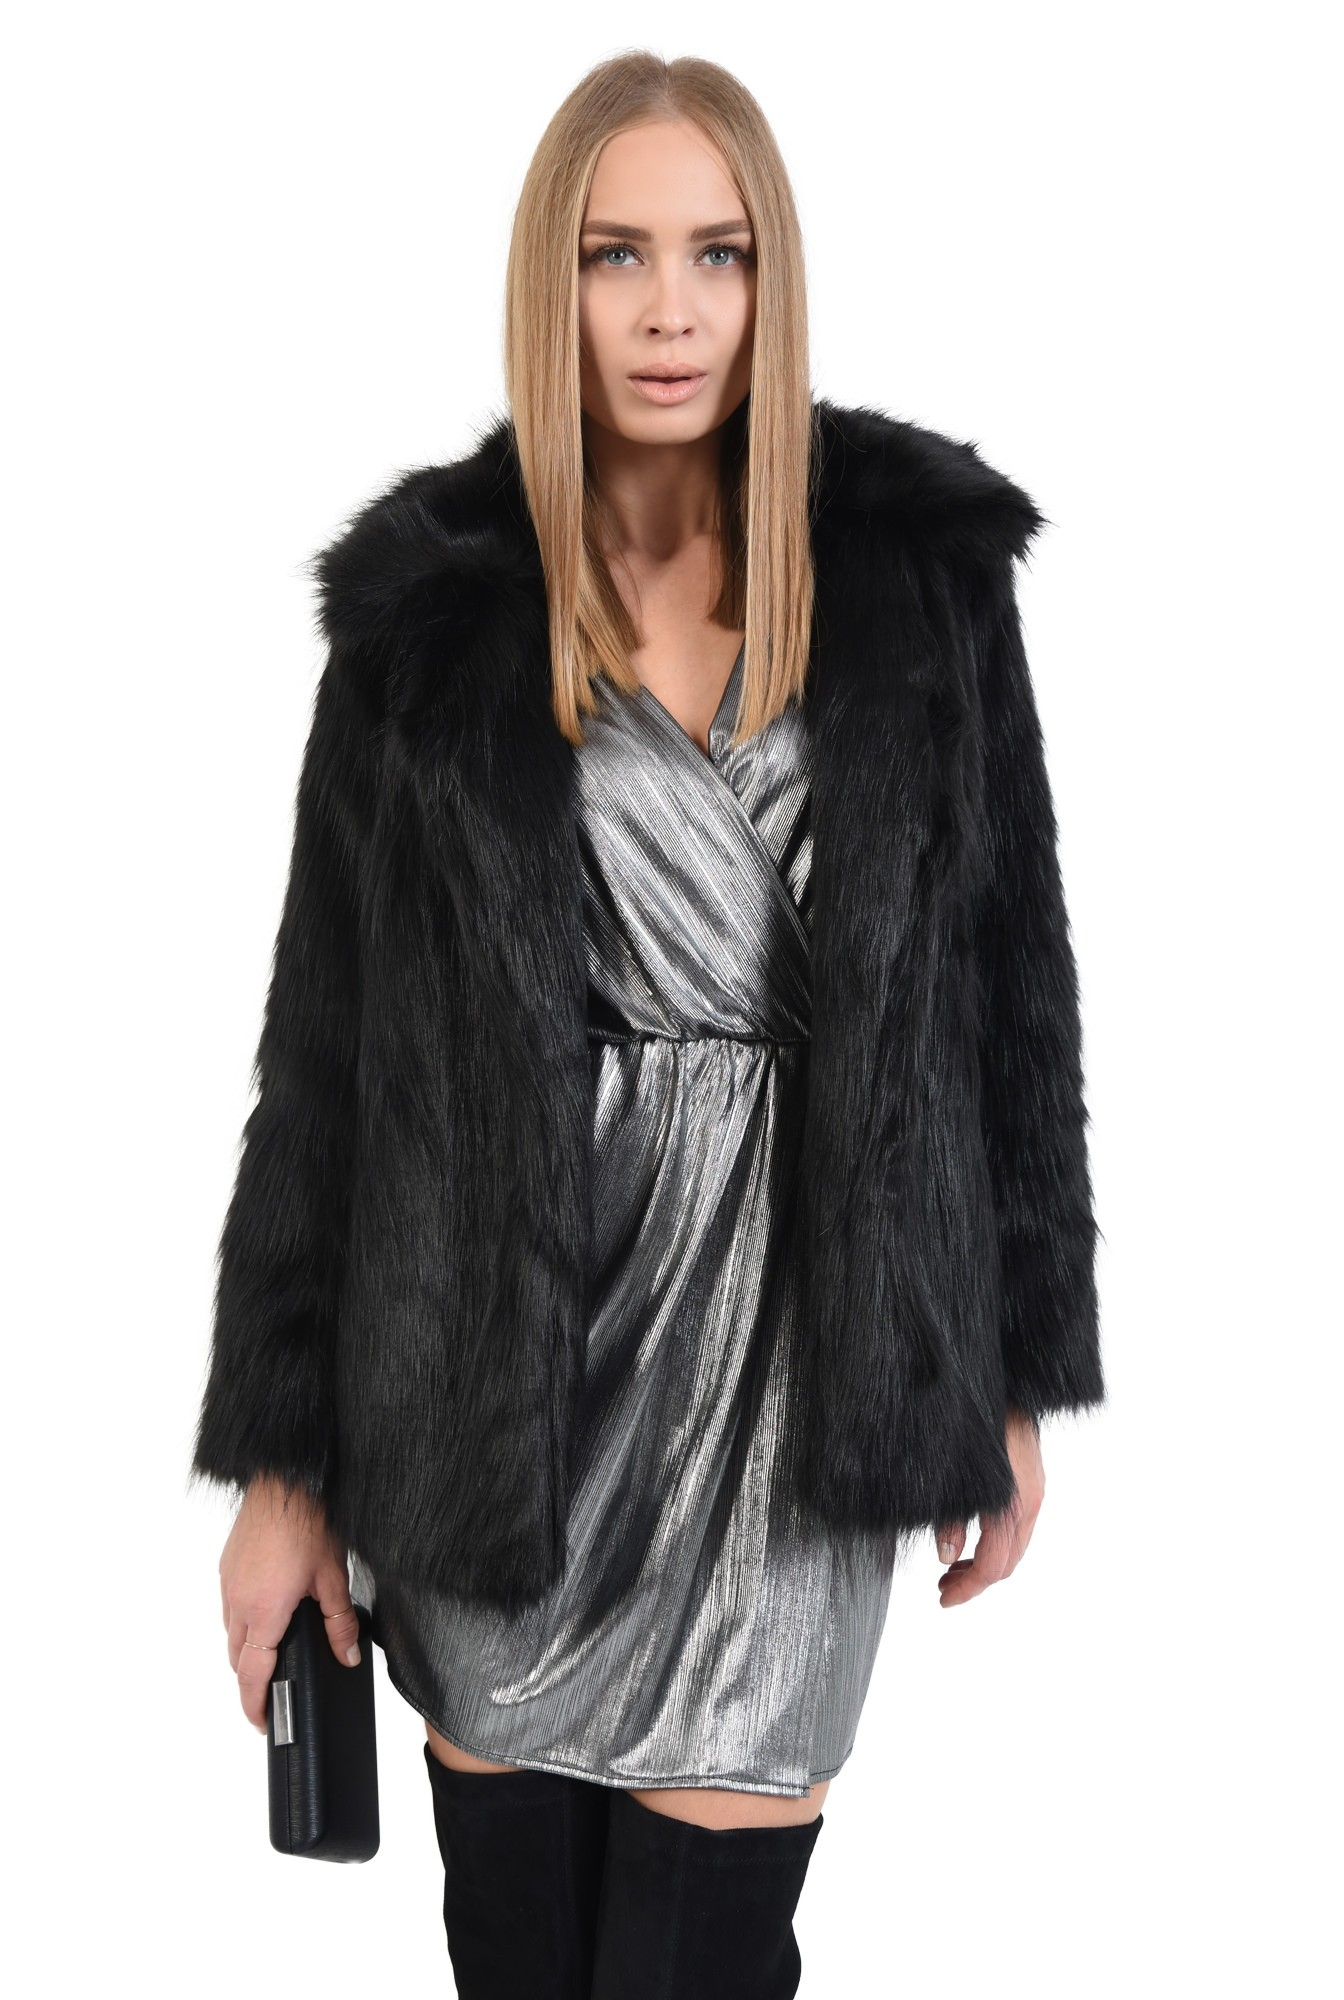 jacheta din blana artificiala, croi drept, jacheta dama, haina blana online